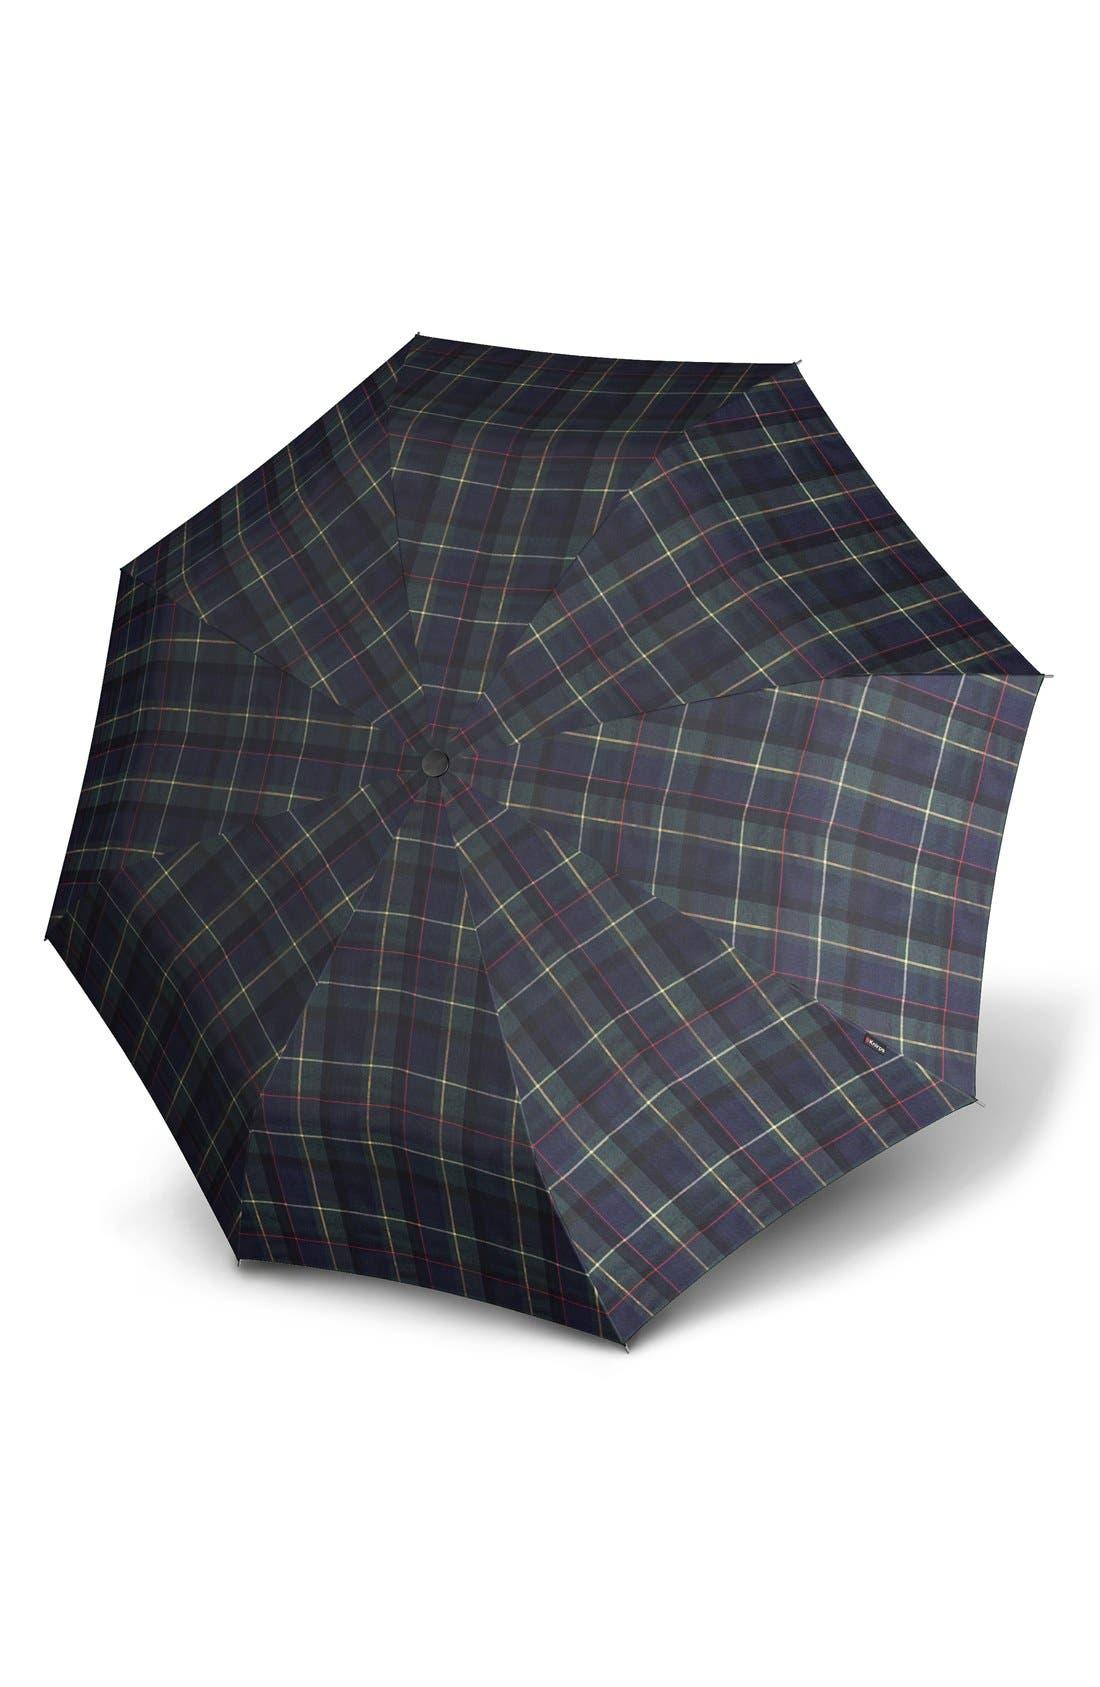 Knirps 'Duomatic' Umbrella